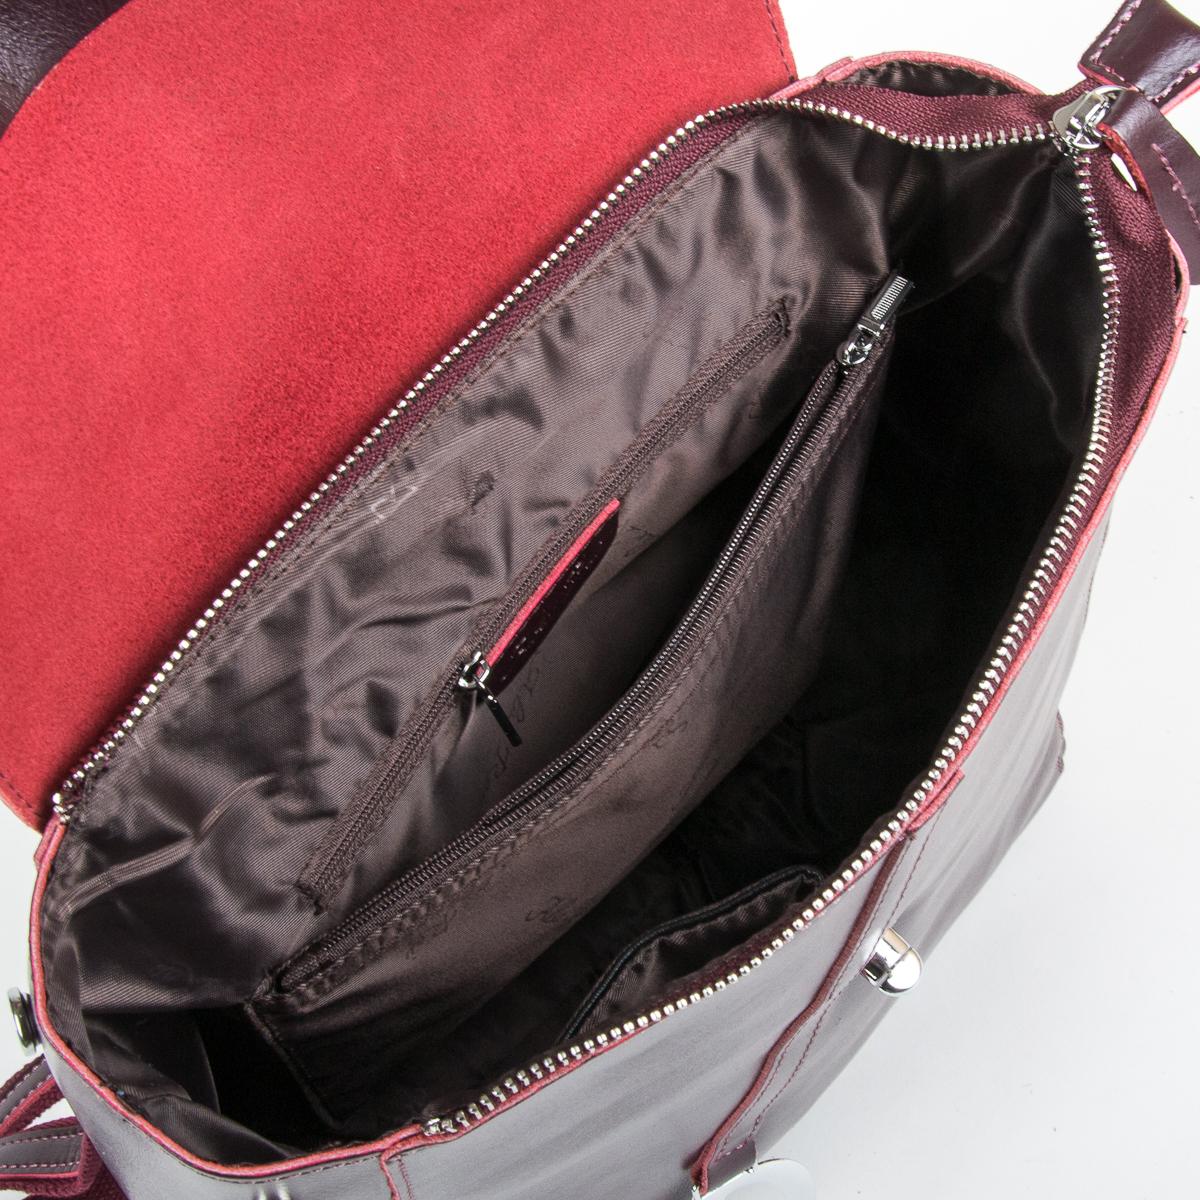 Сумка Женская Рюкзак кожа ALEX RAI 9-01 360 wine-red - фото 5